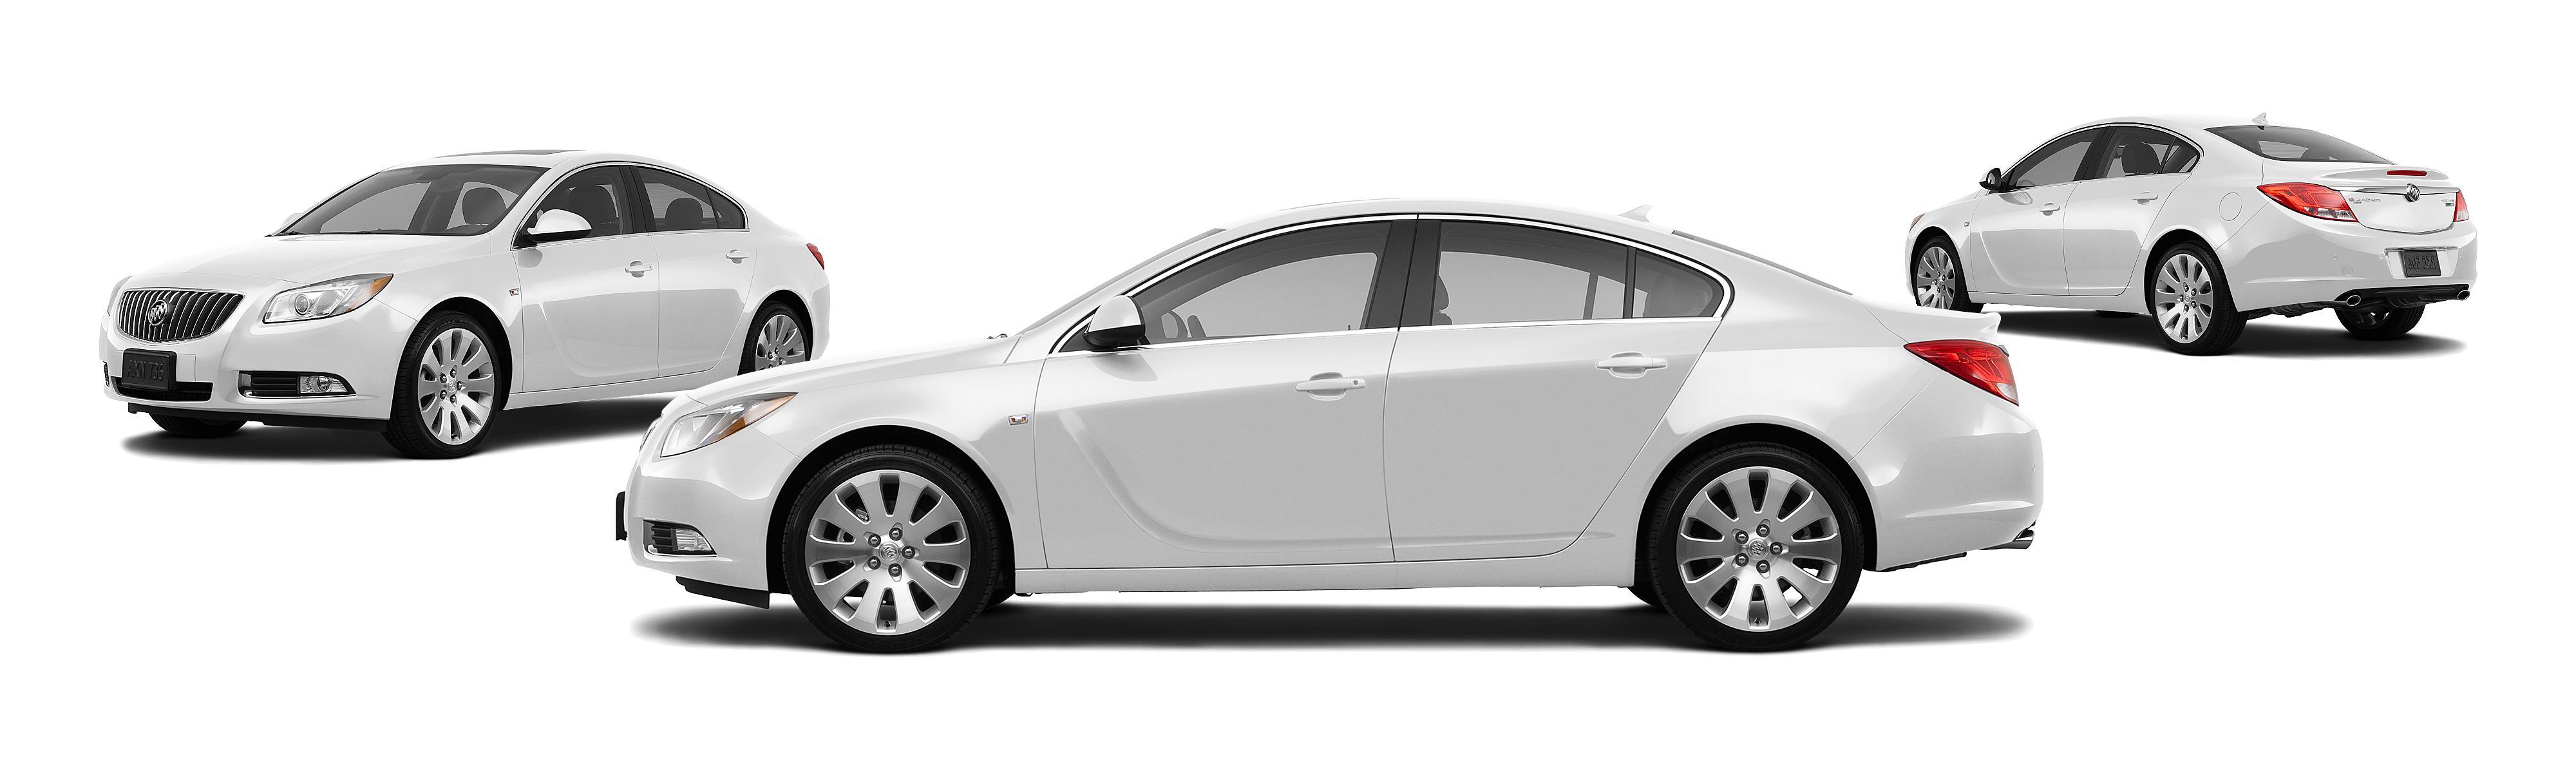 turbo inventory s premium tj regal automatic buick auto